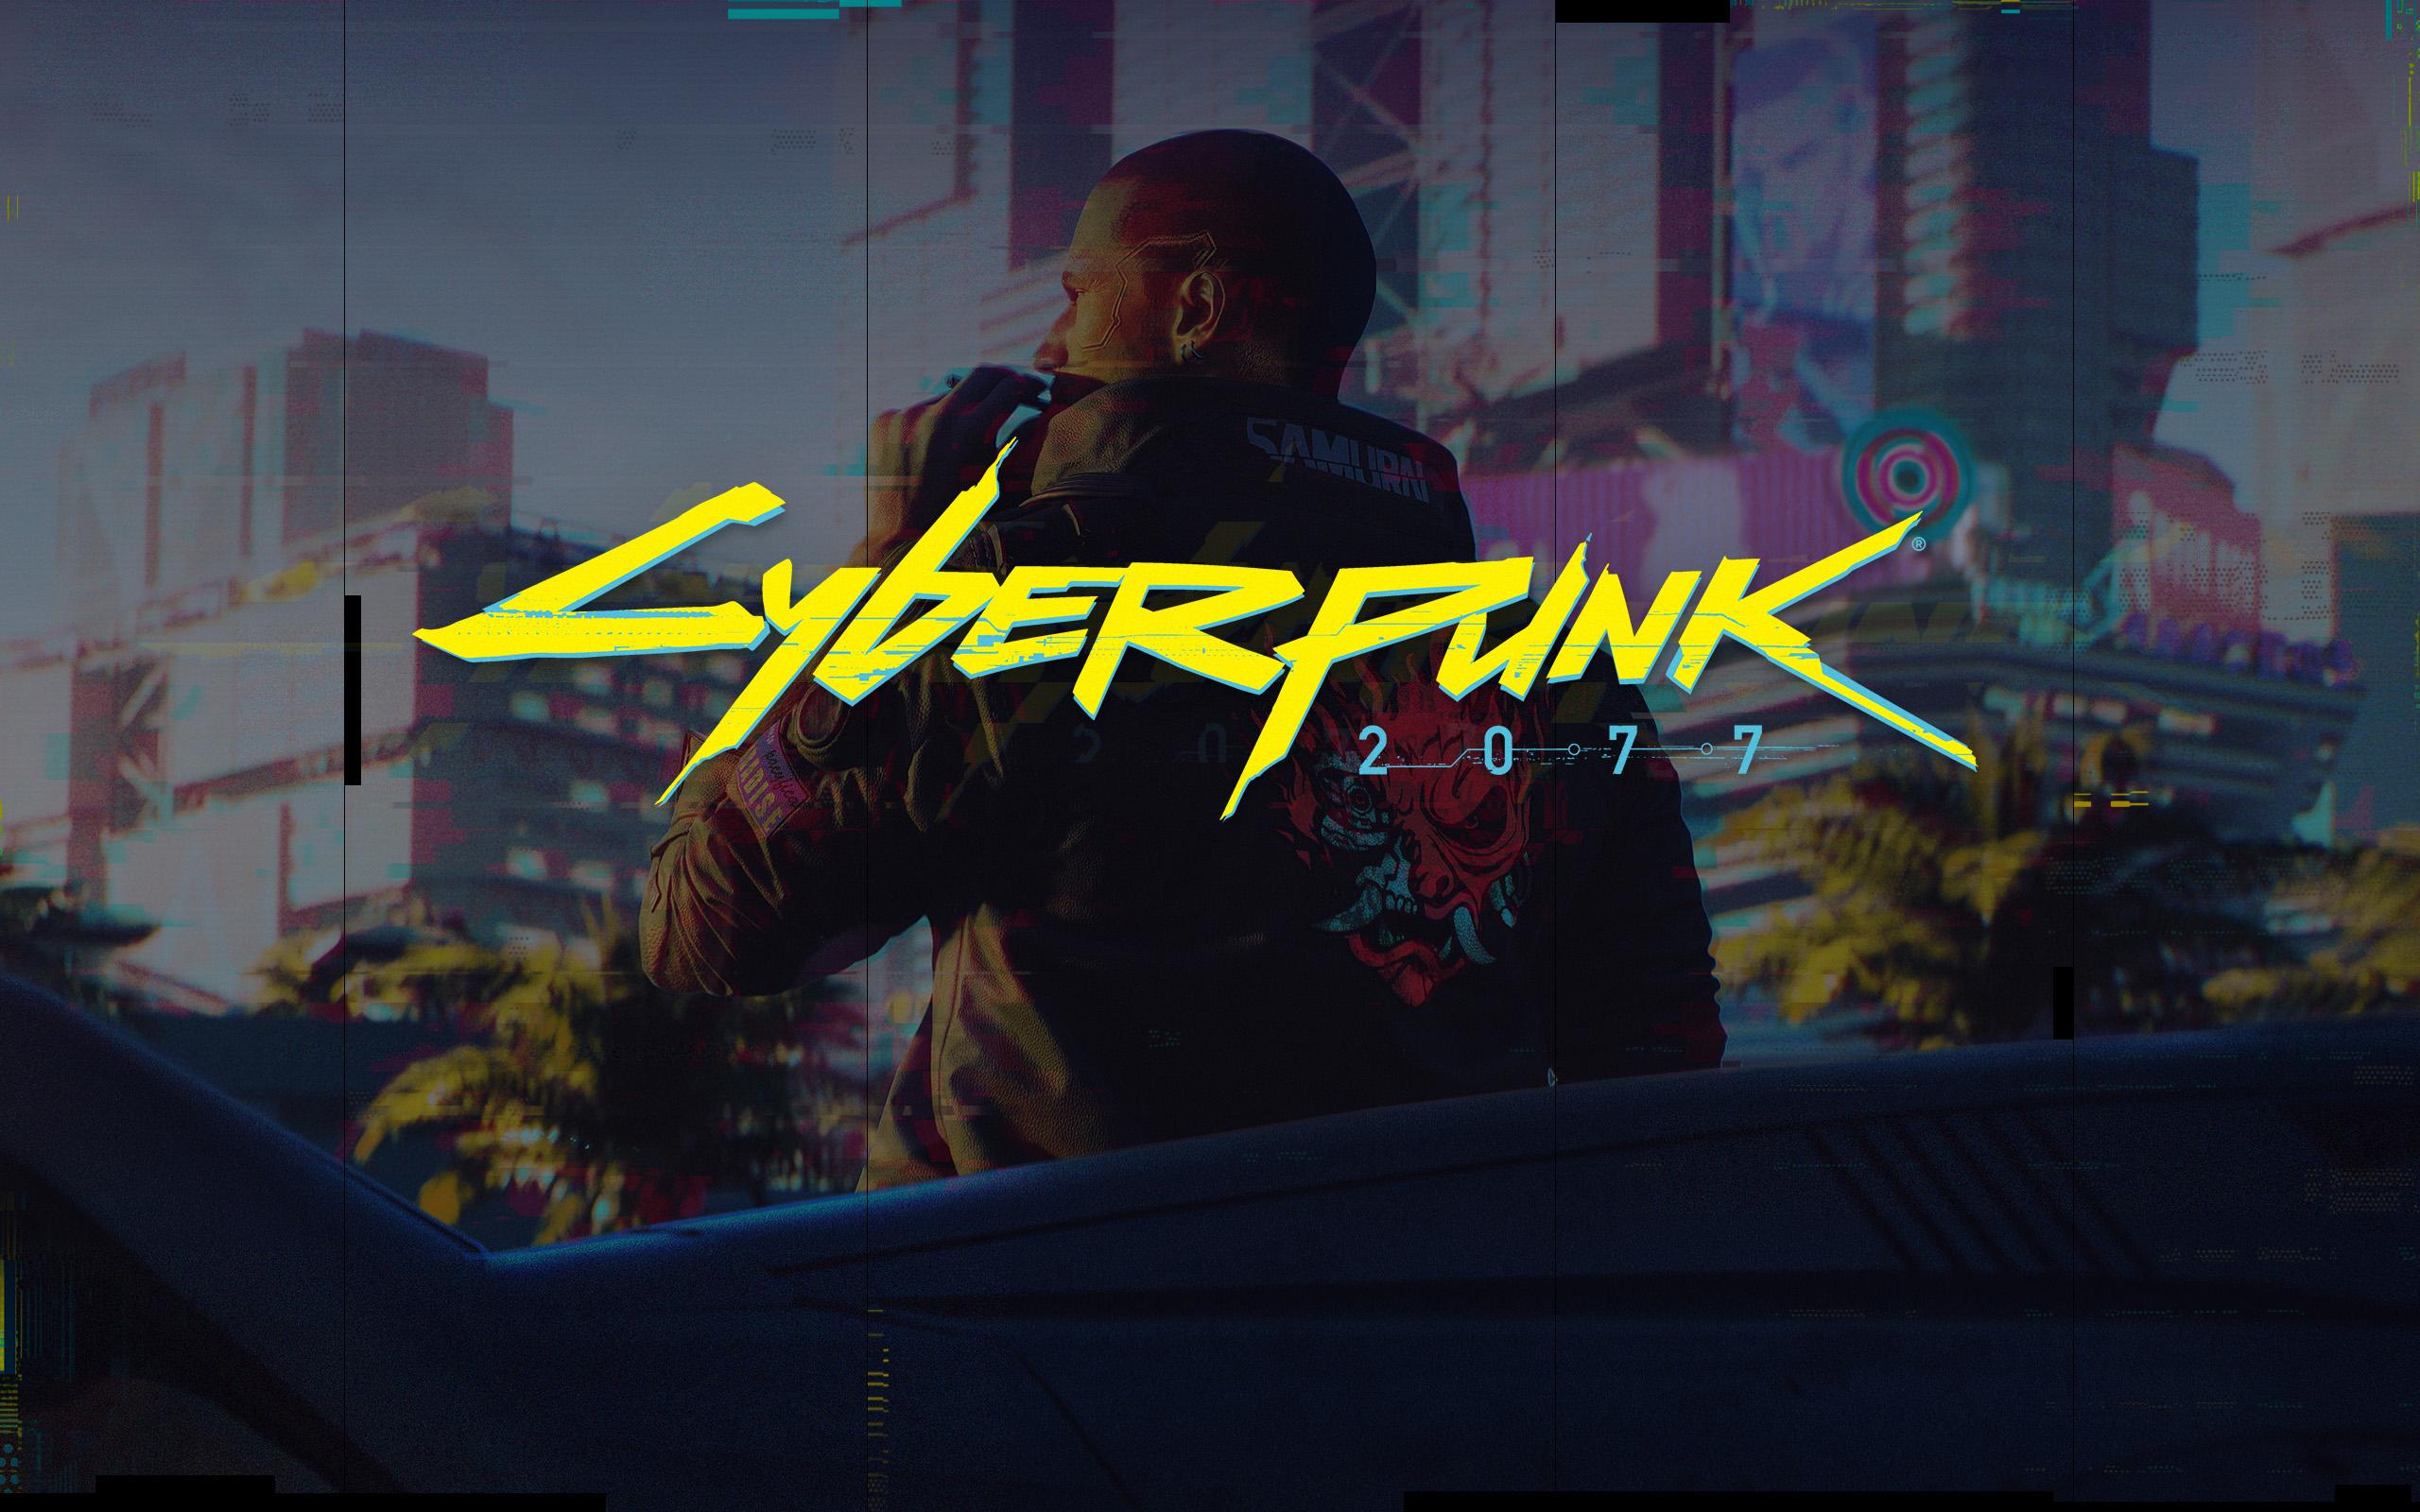 cyberpunk 2077 oynanis